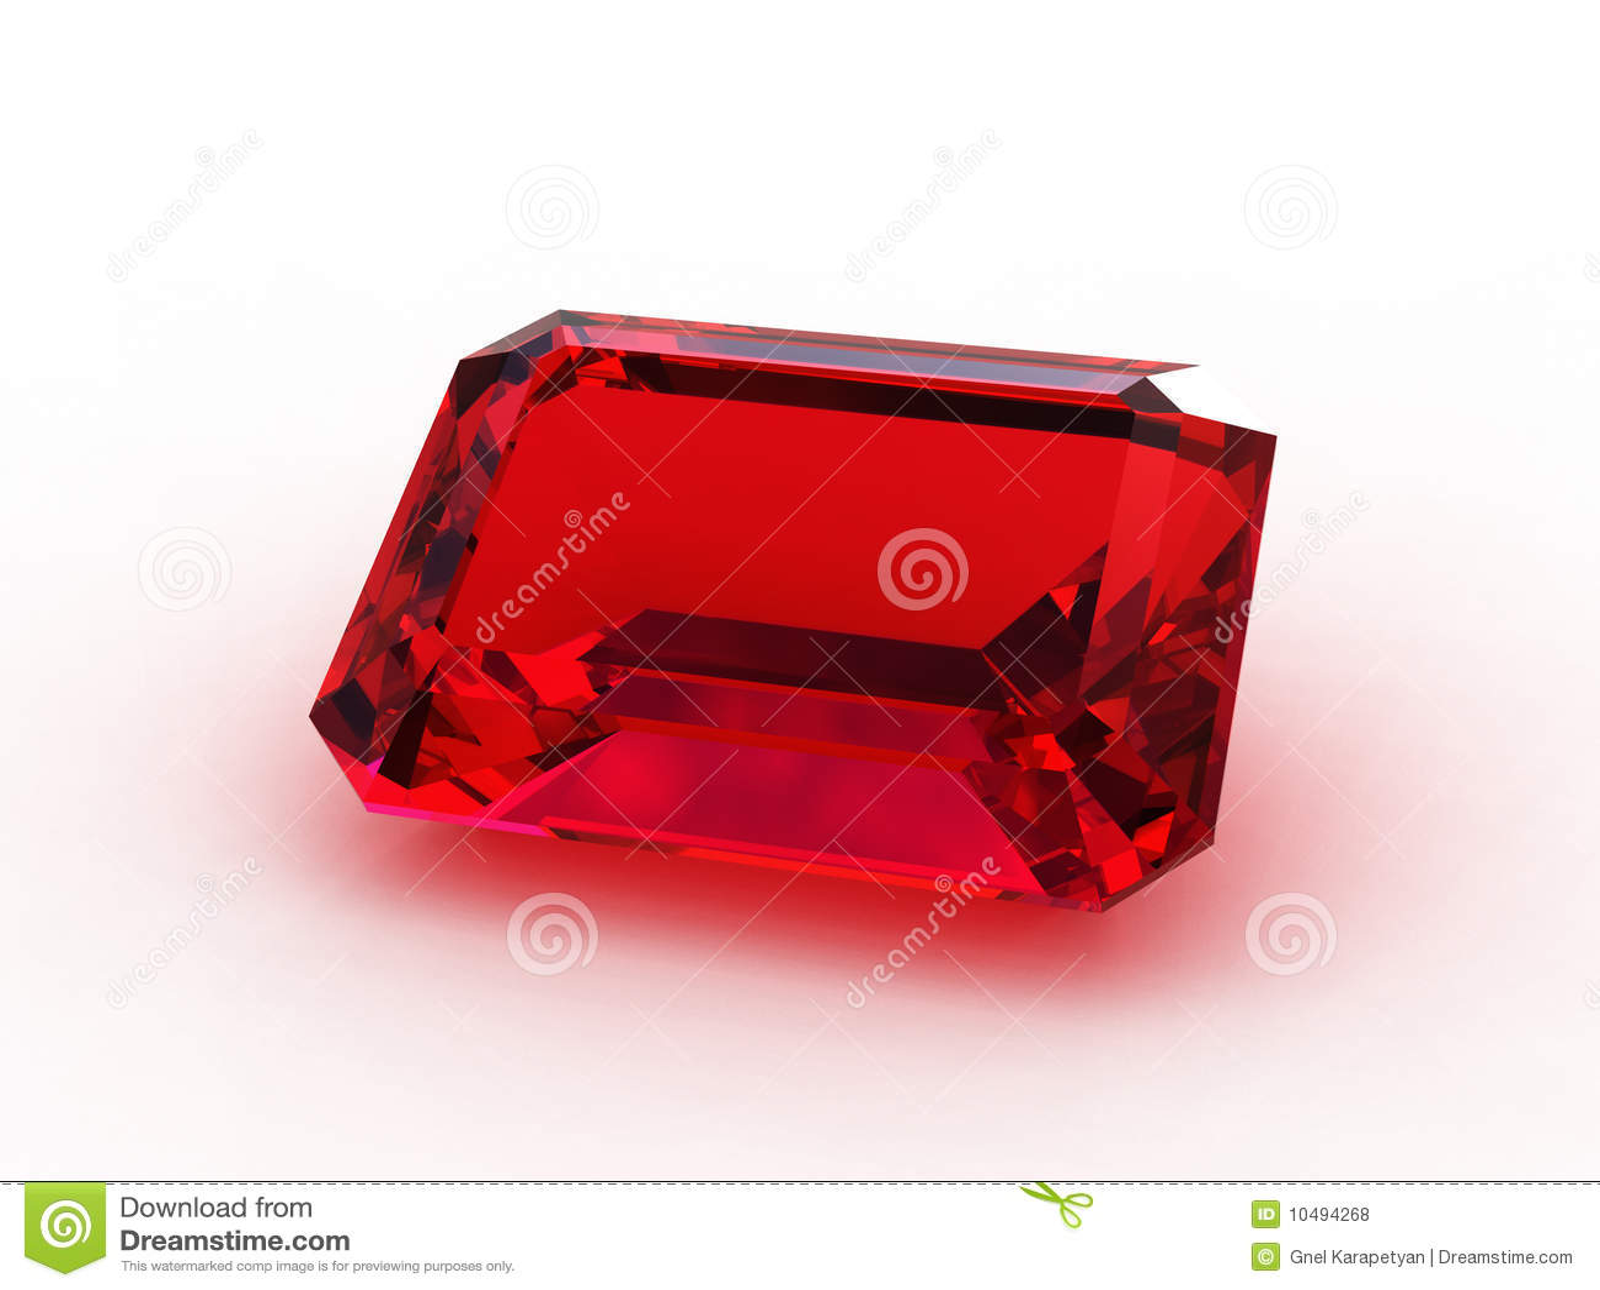 Large Emerald Cut Ruby Gemstone Royalty Free Stock Photos ...